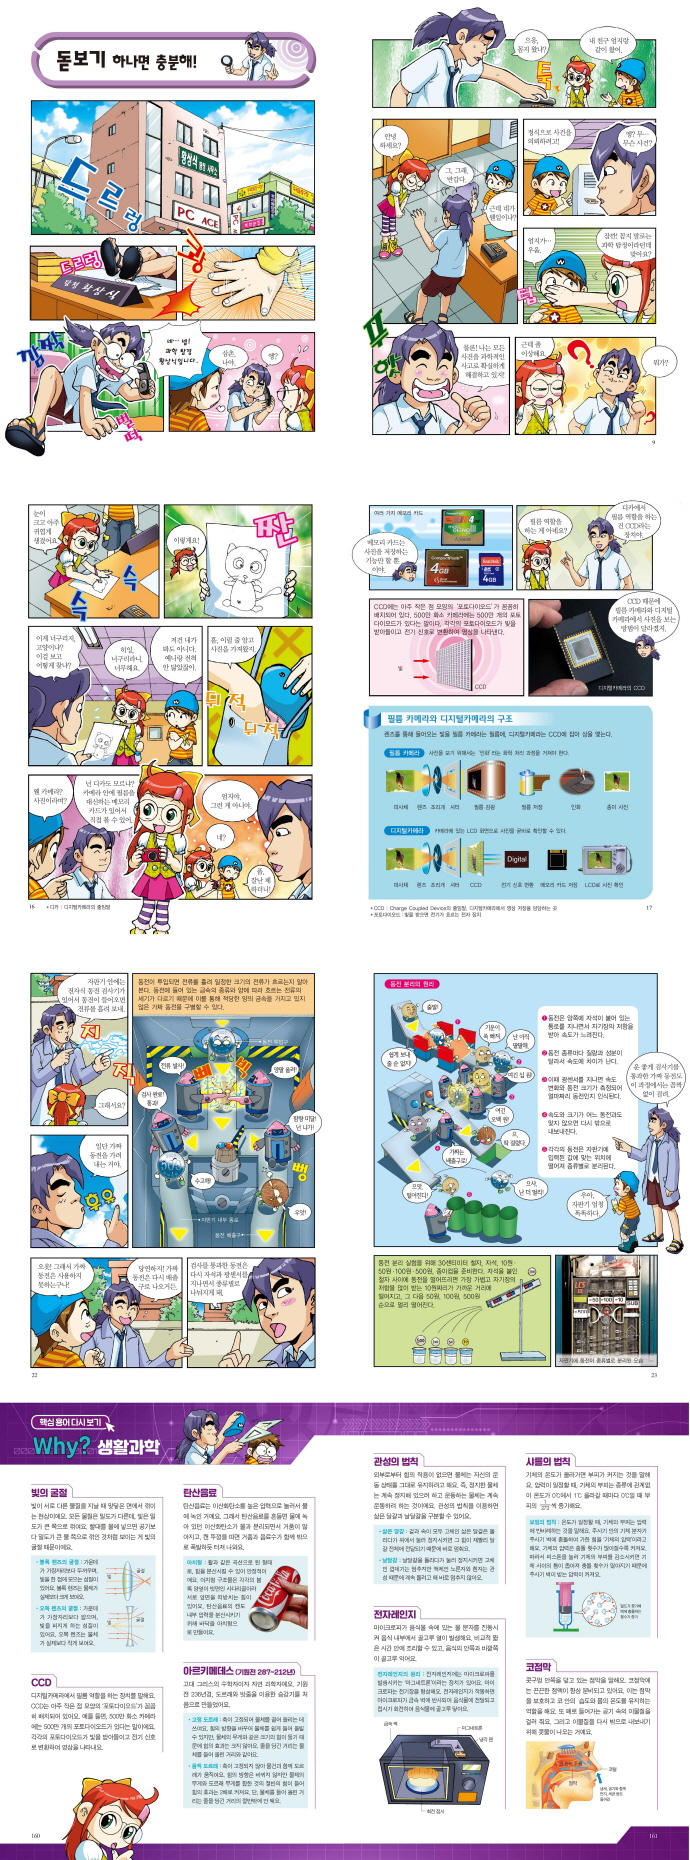 Why? 생활과학(초등과학학습만화 47)(양장본 HardCover) 도서 상세이미지